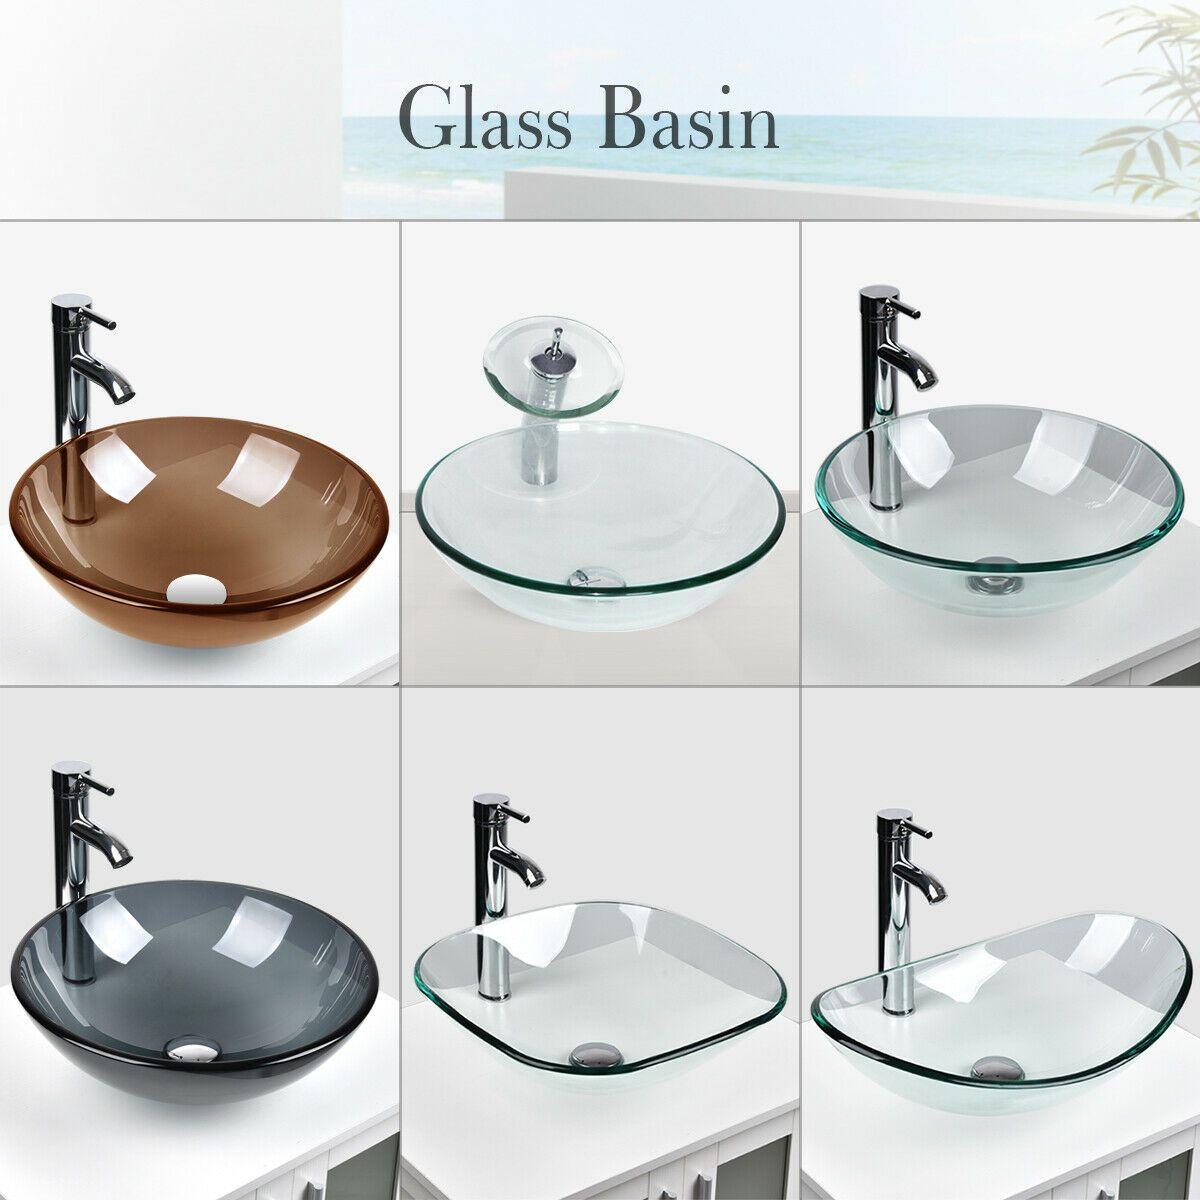 Bathroom Tempered Clear Glass Vessel Sink Bath Basin Bowl Faucet